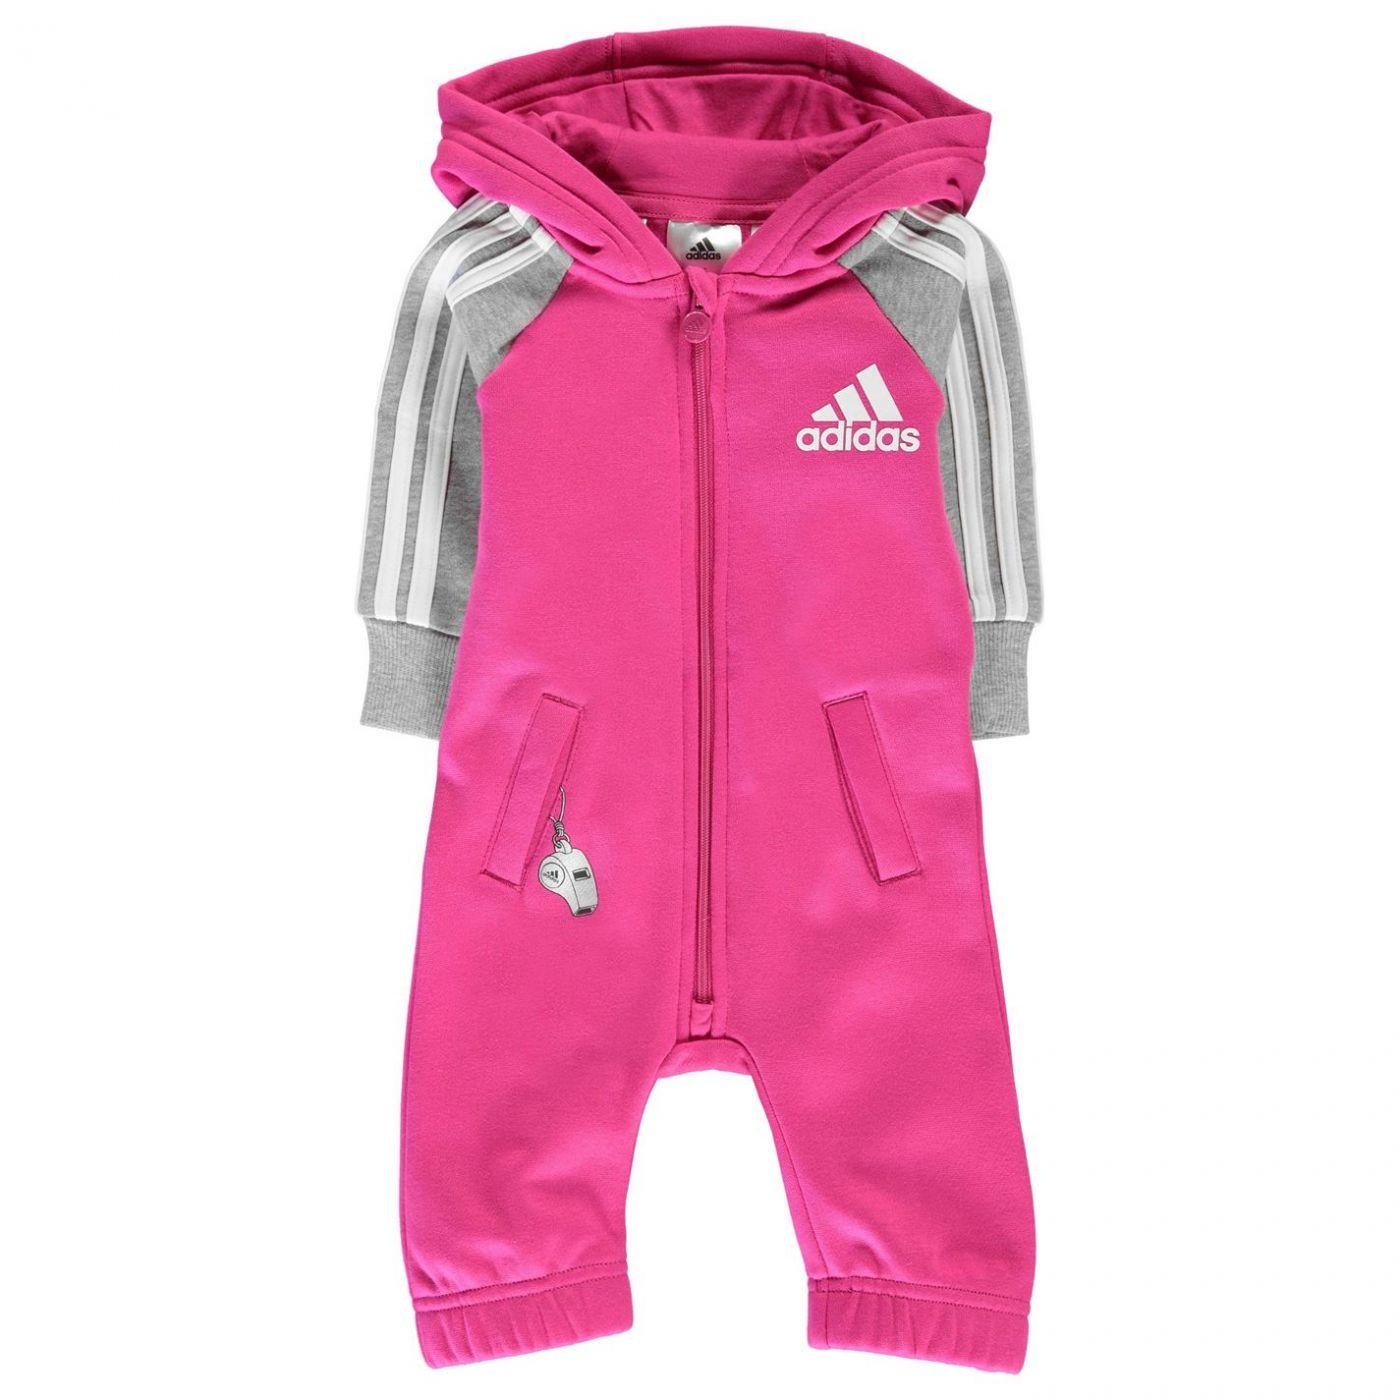 Adidas Tracksuit Onesie Babies